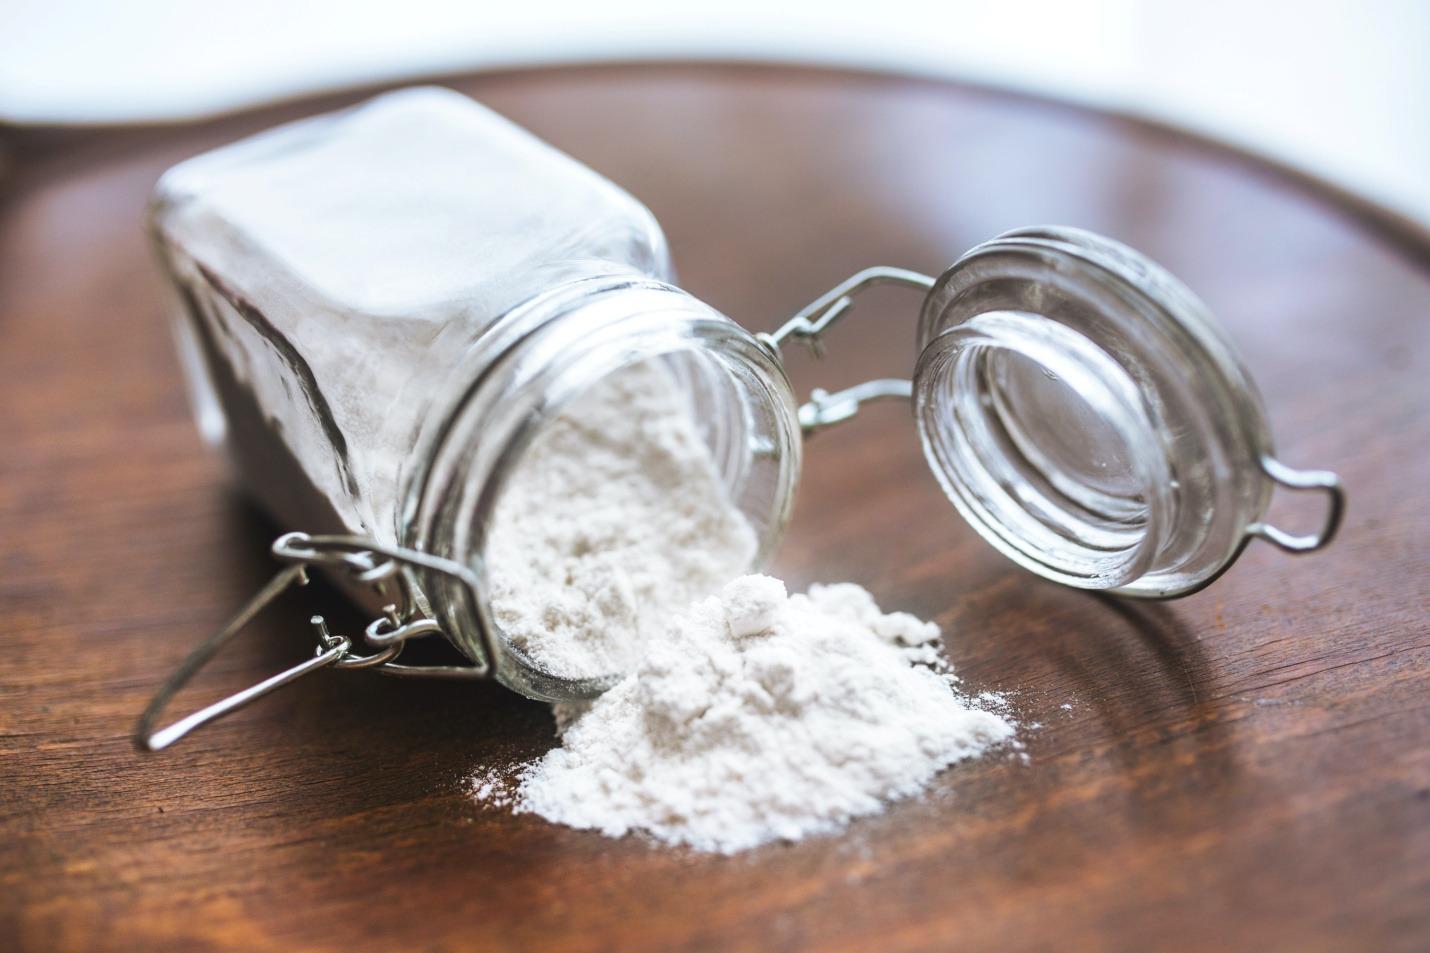 Baking soda in homemade dishwasher pods